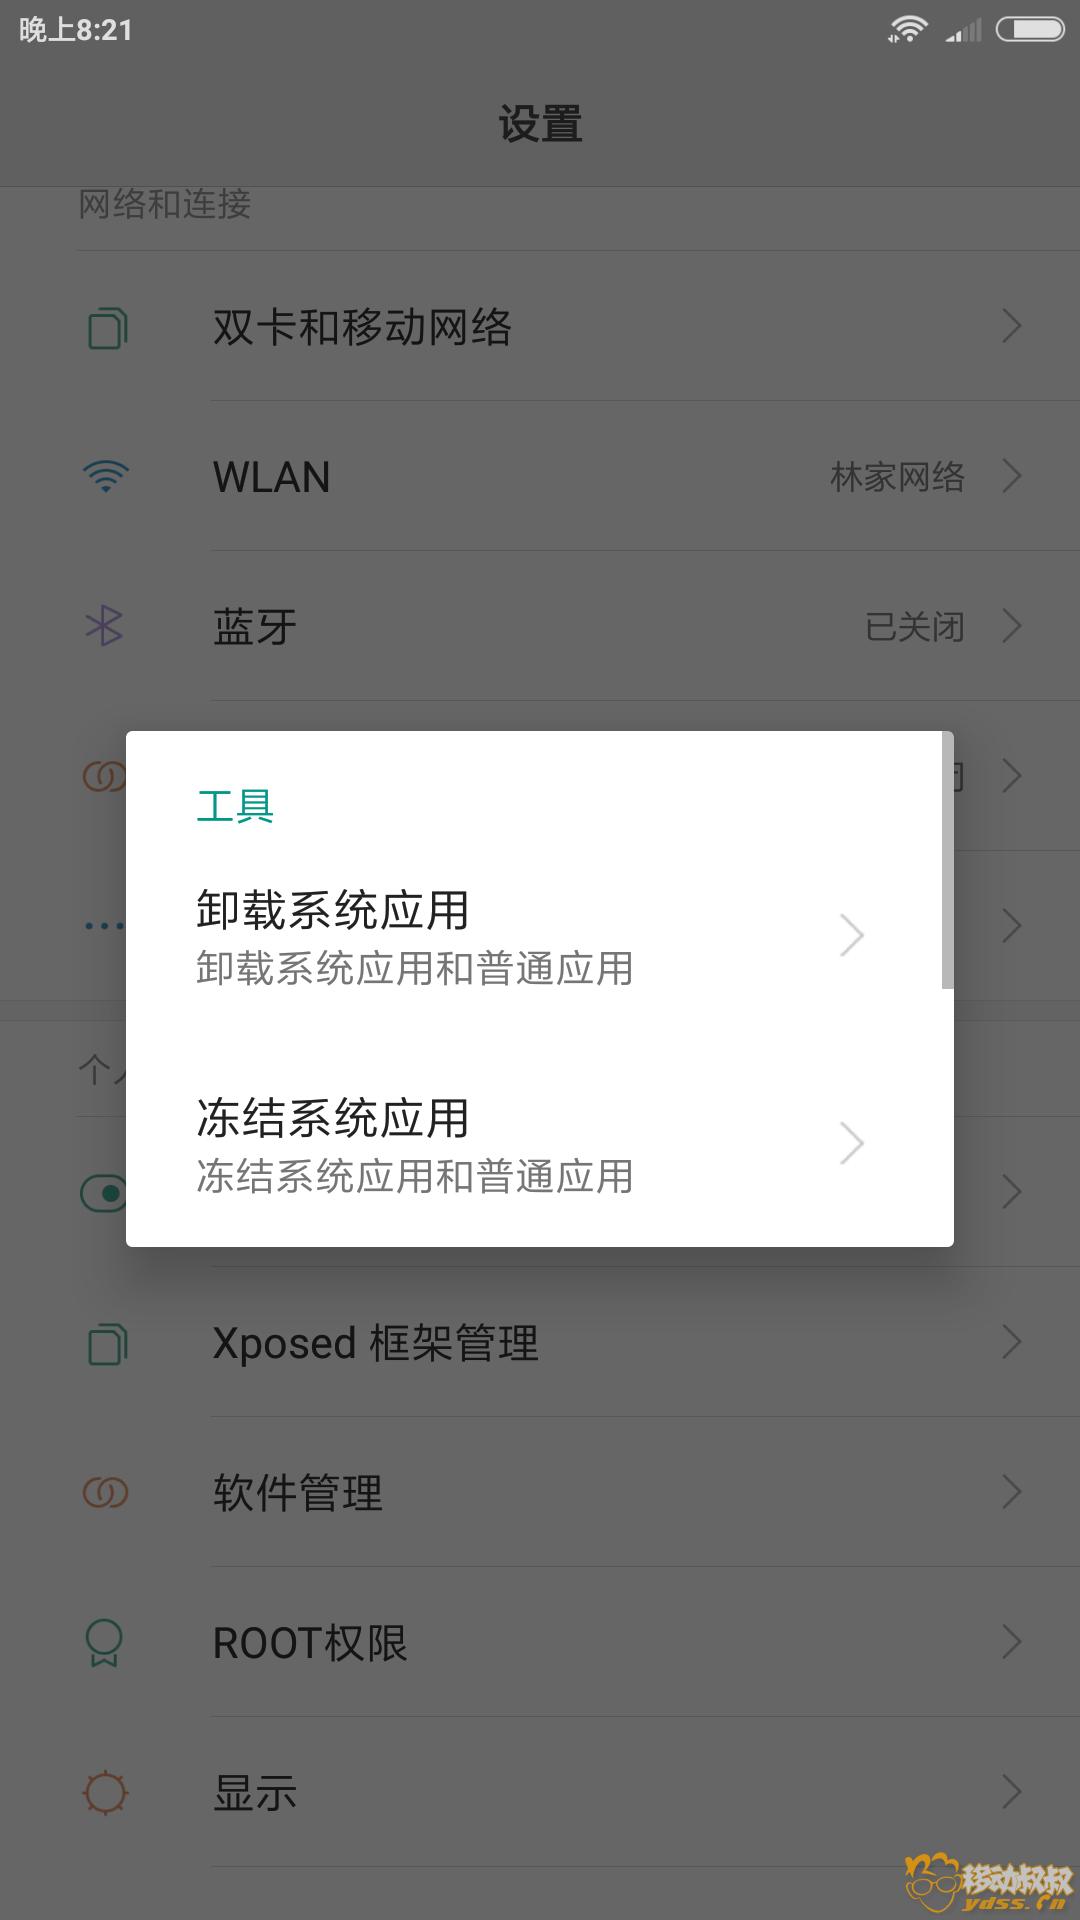 Screenshot_2018-02-28-20-21-04-413_com.zhanhong.tools.png